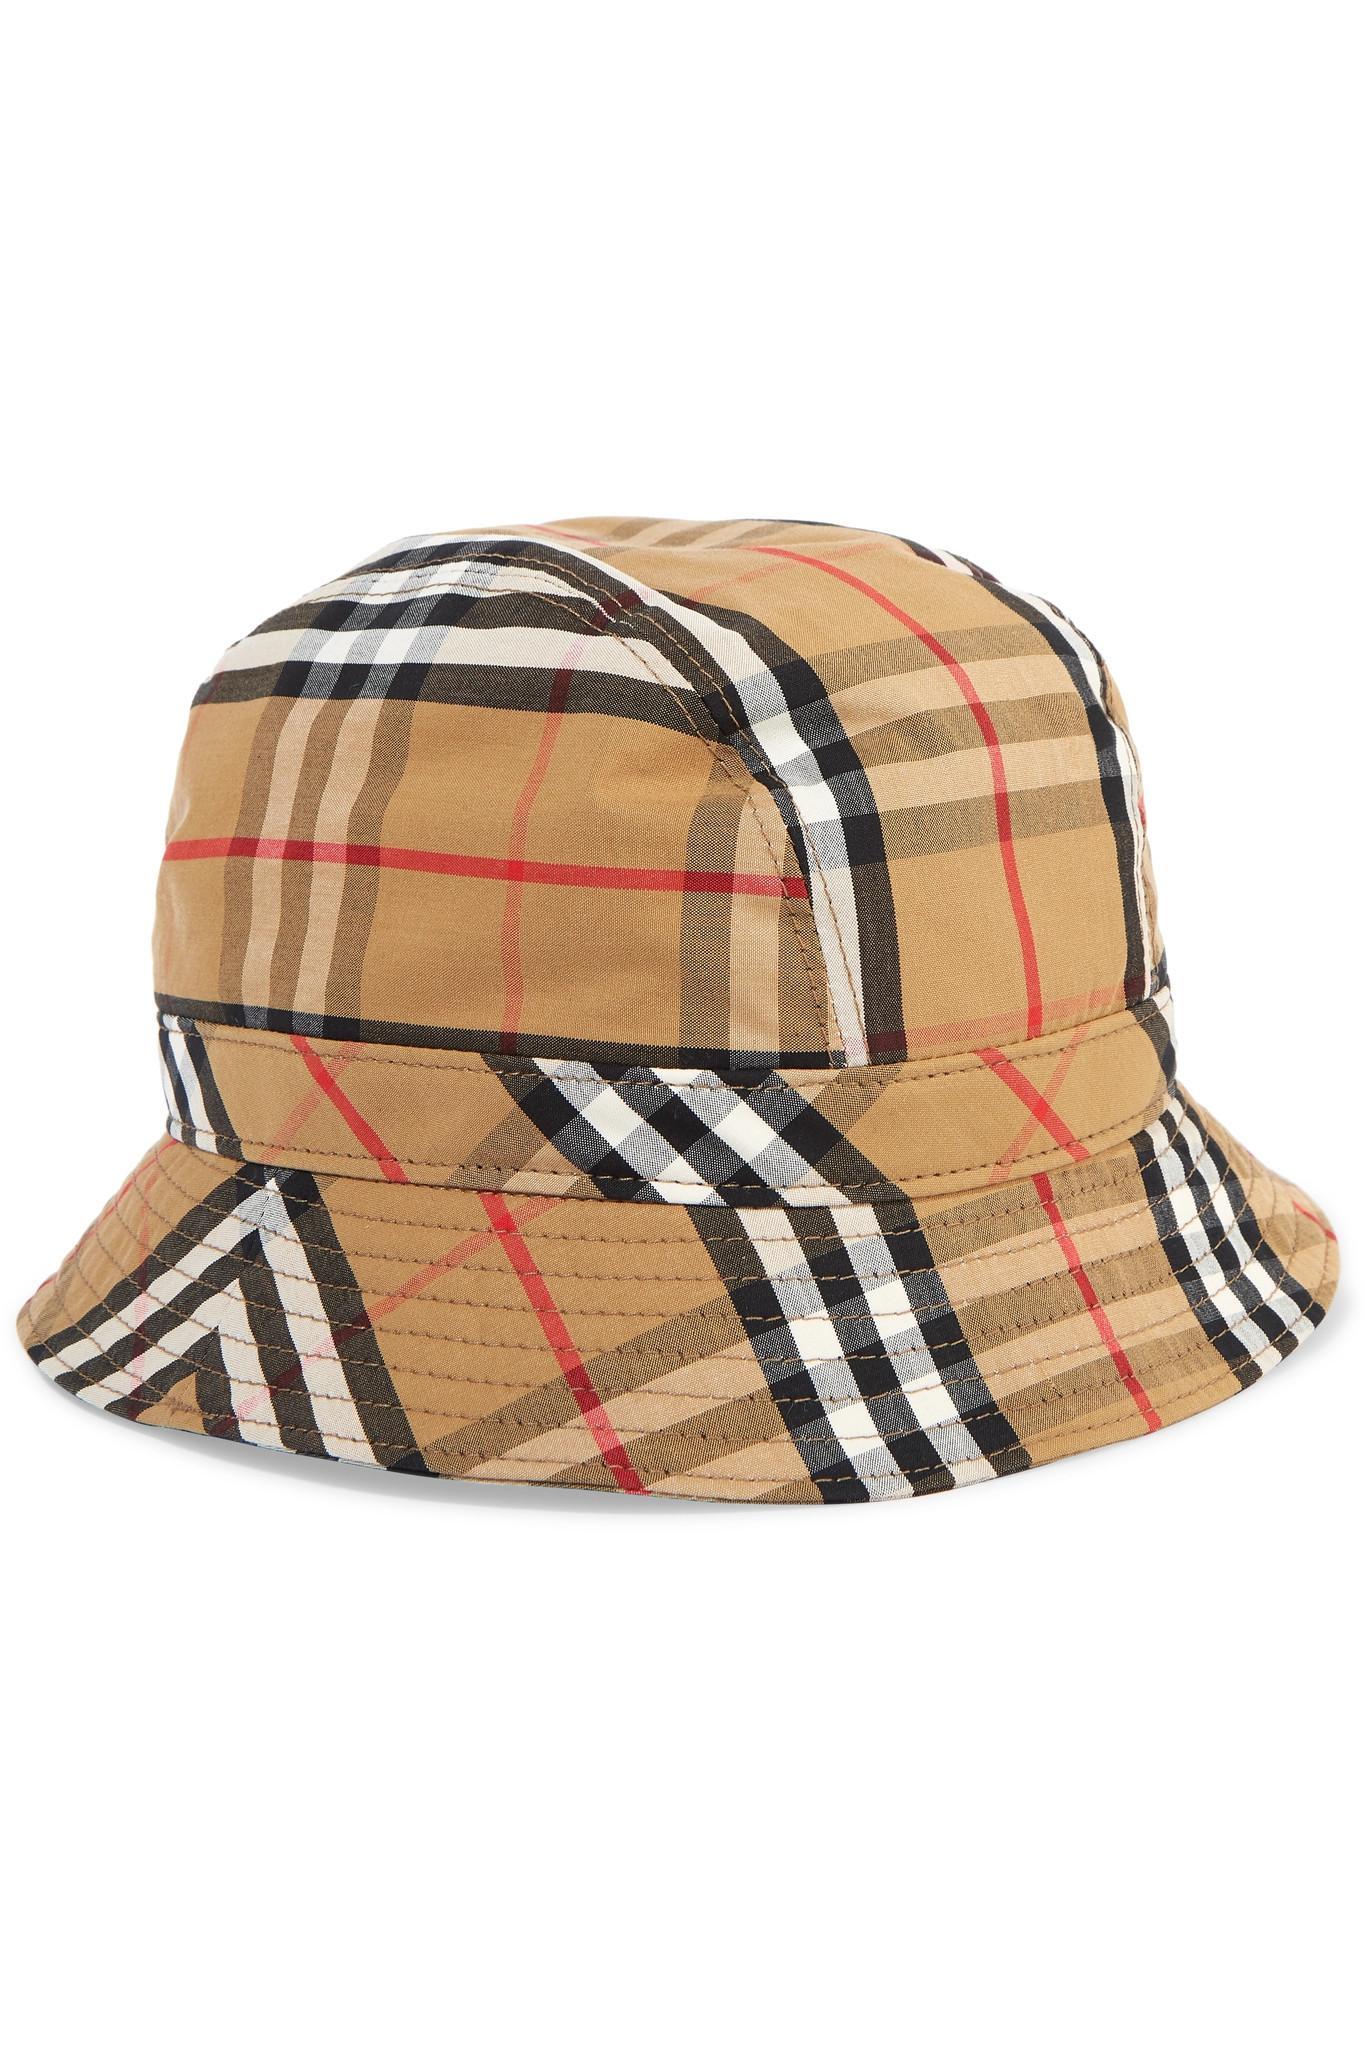 Burberry. Women s Checked Cotton-canvas Bucket Hat 039fc8782d